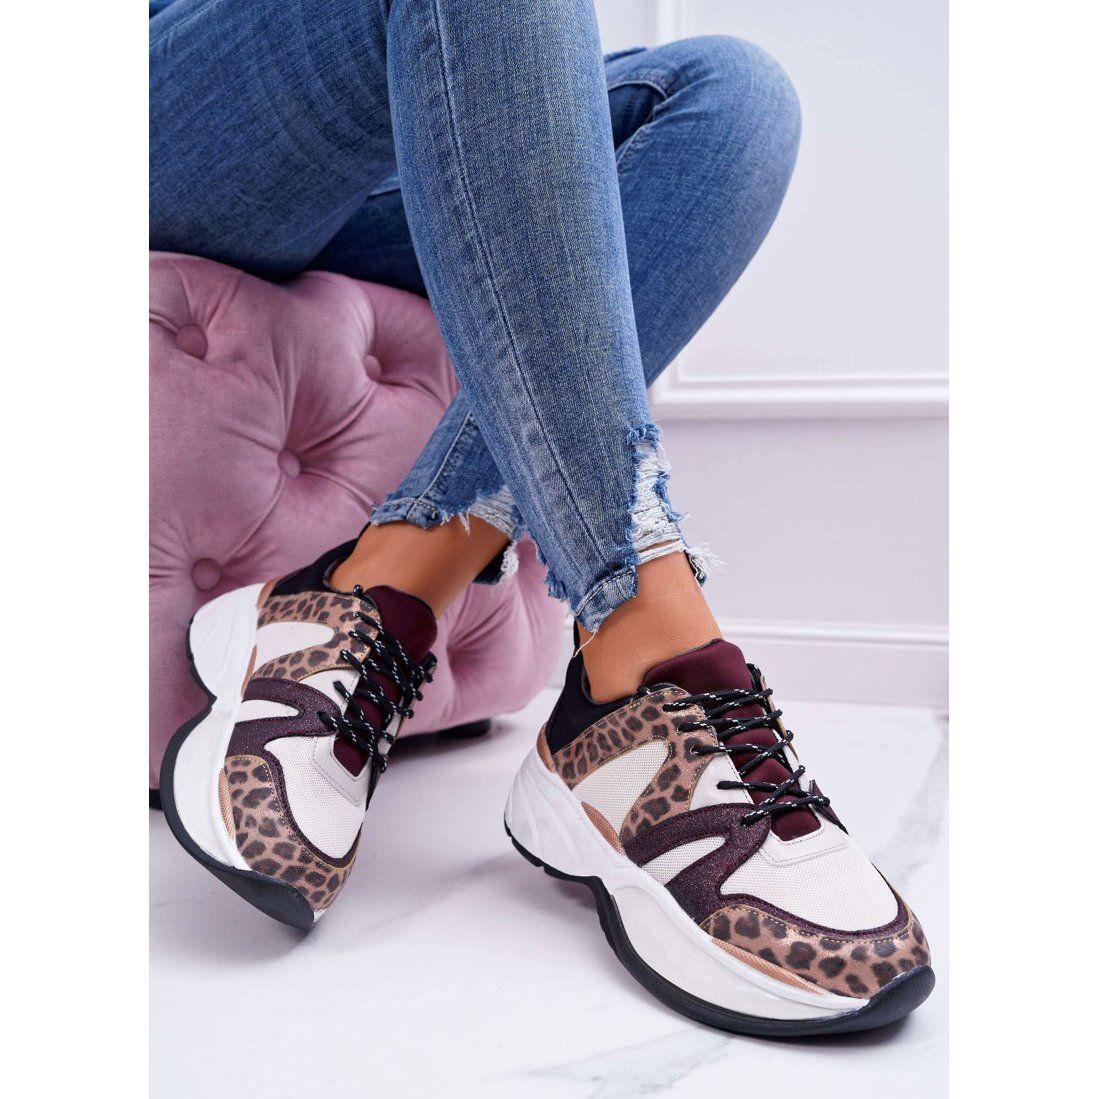 Damskie Sportowe Obuwie Bordowe Skora Weza Larey Brazowe Czerwone Wielokolorowe Shoes Golden Goose Sneaker Sneakers